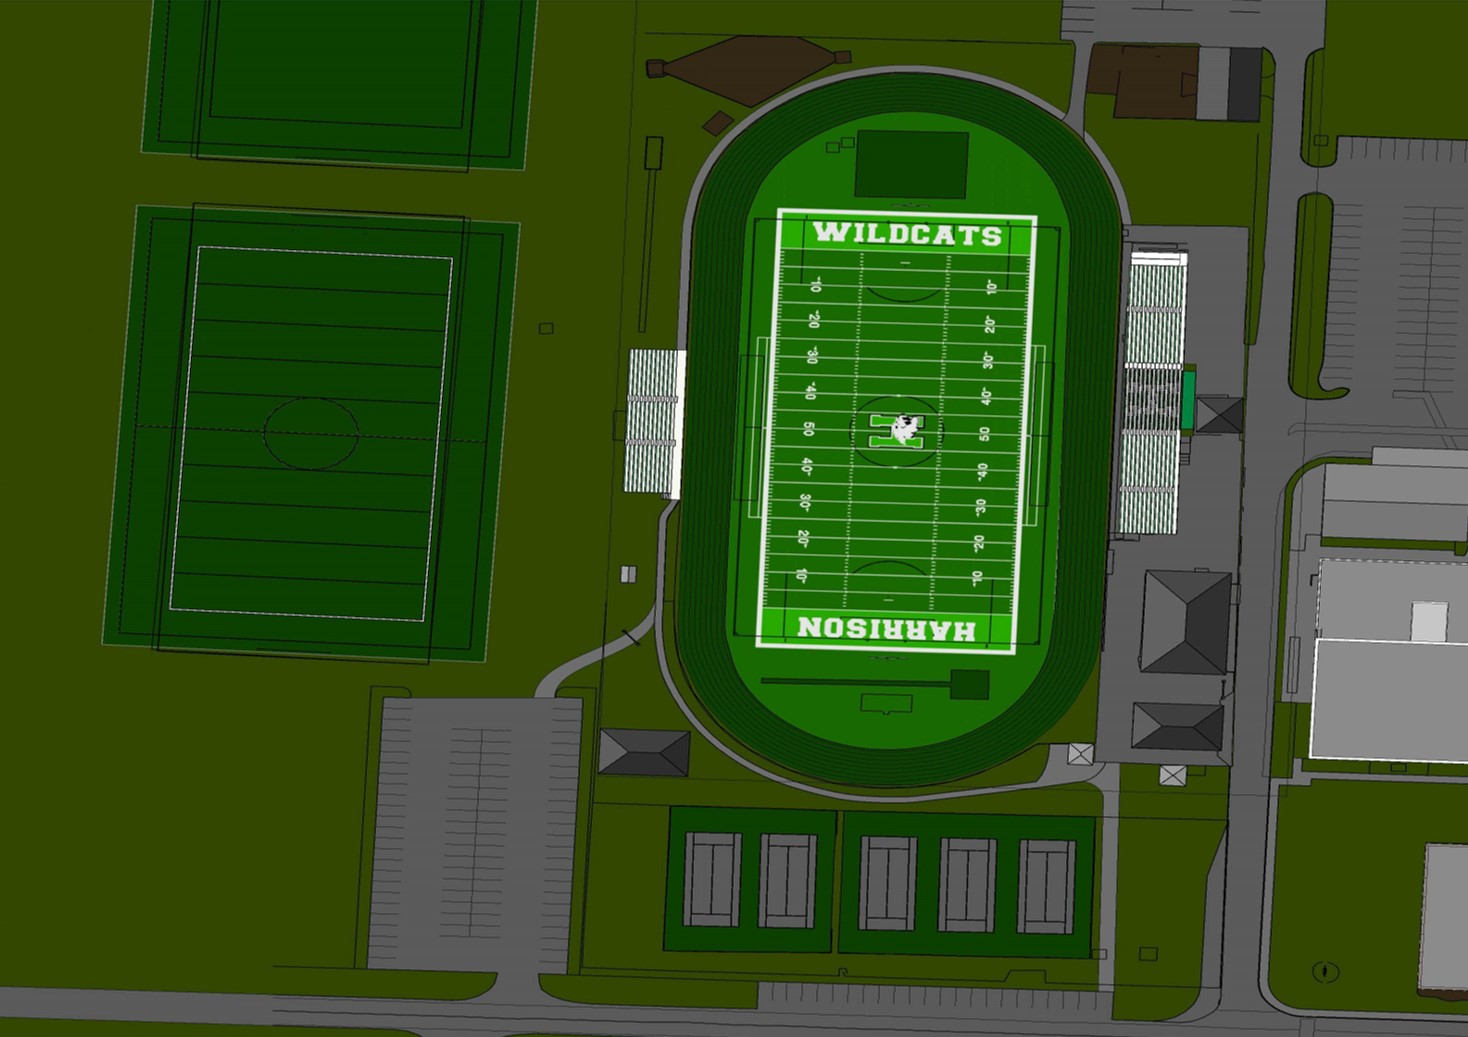 Rendering of new field